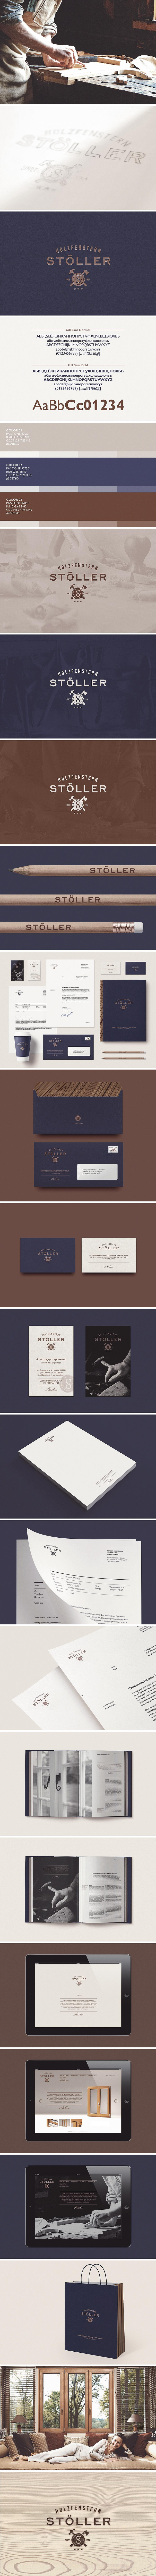 identity & branding design